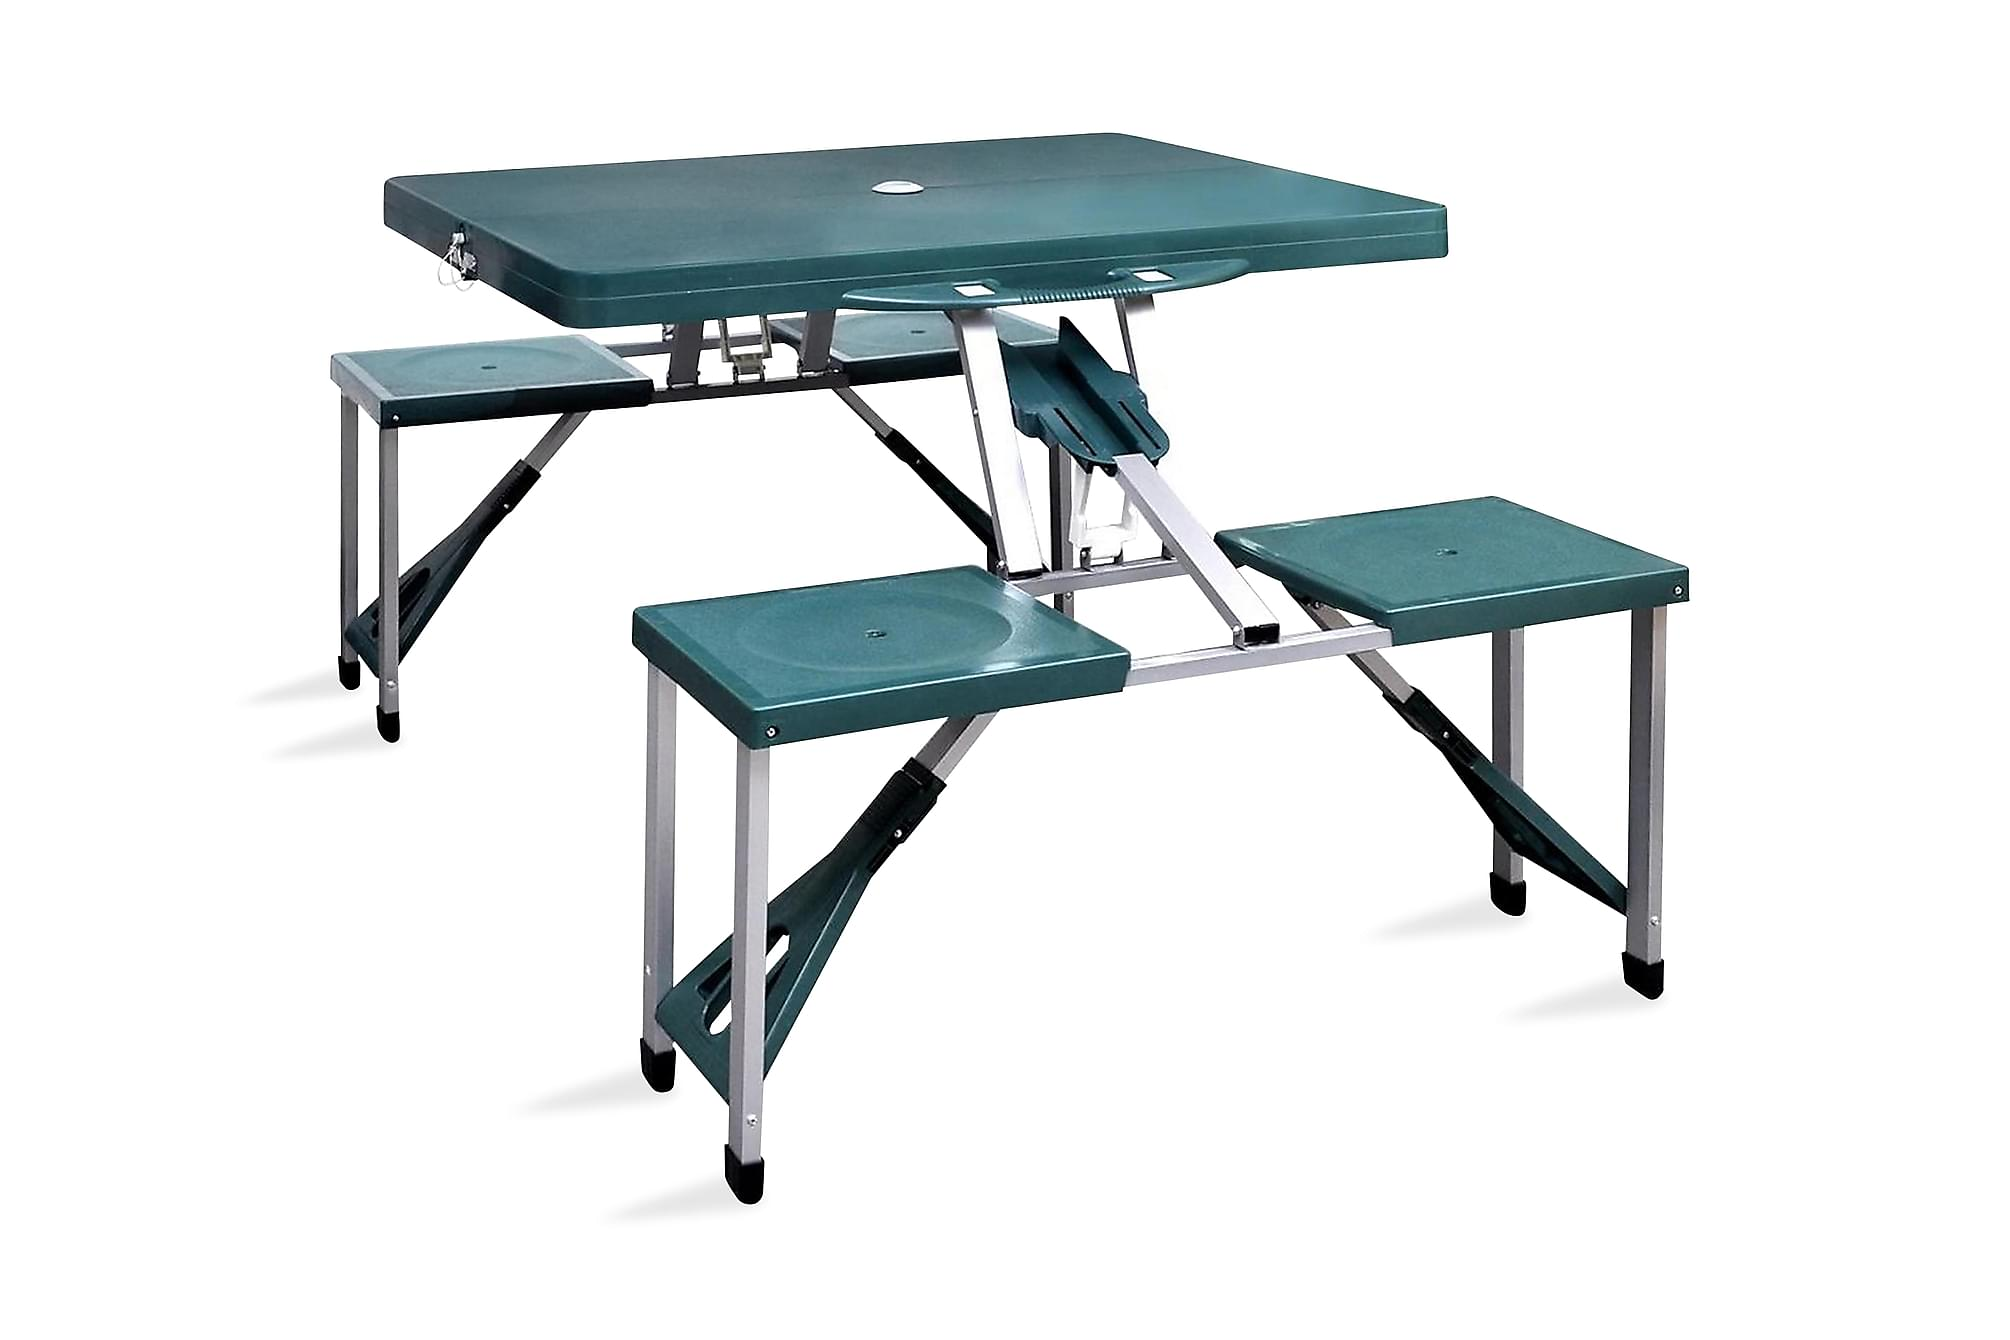 Hopfällbart campingbord m. 4 stolar i aluminium ljusgrönt